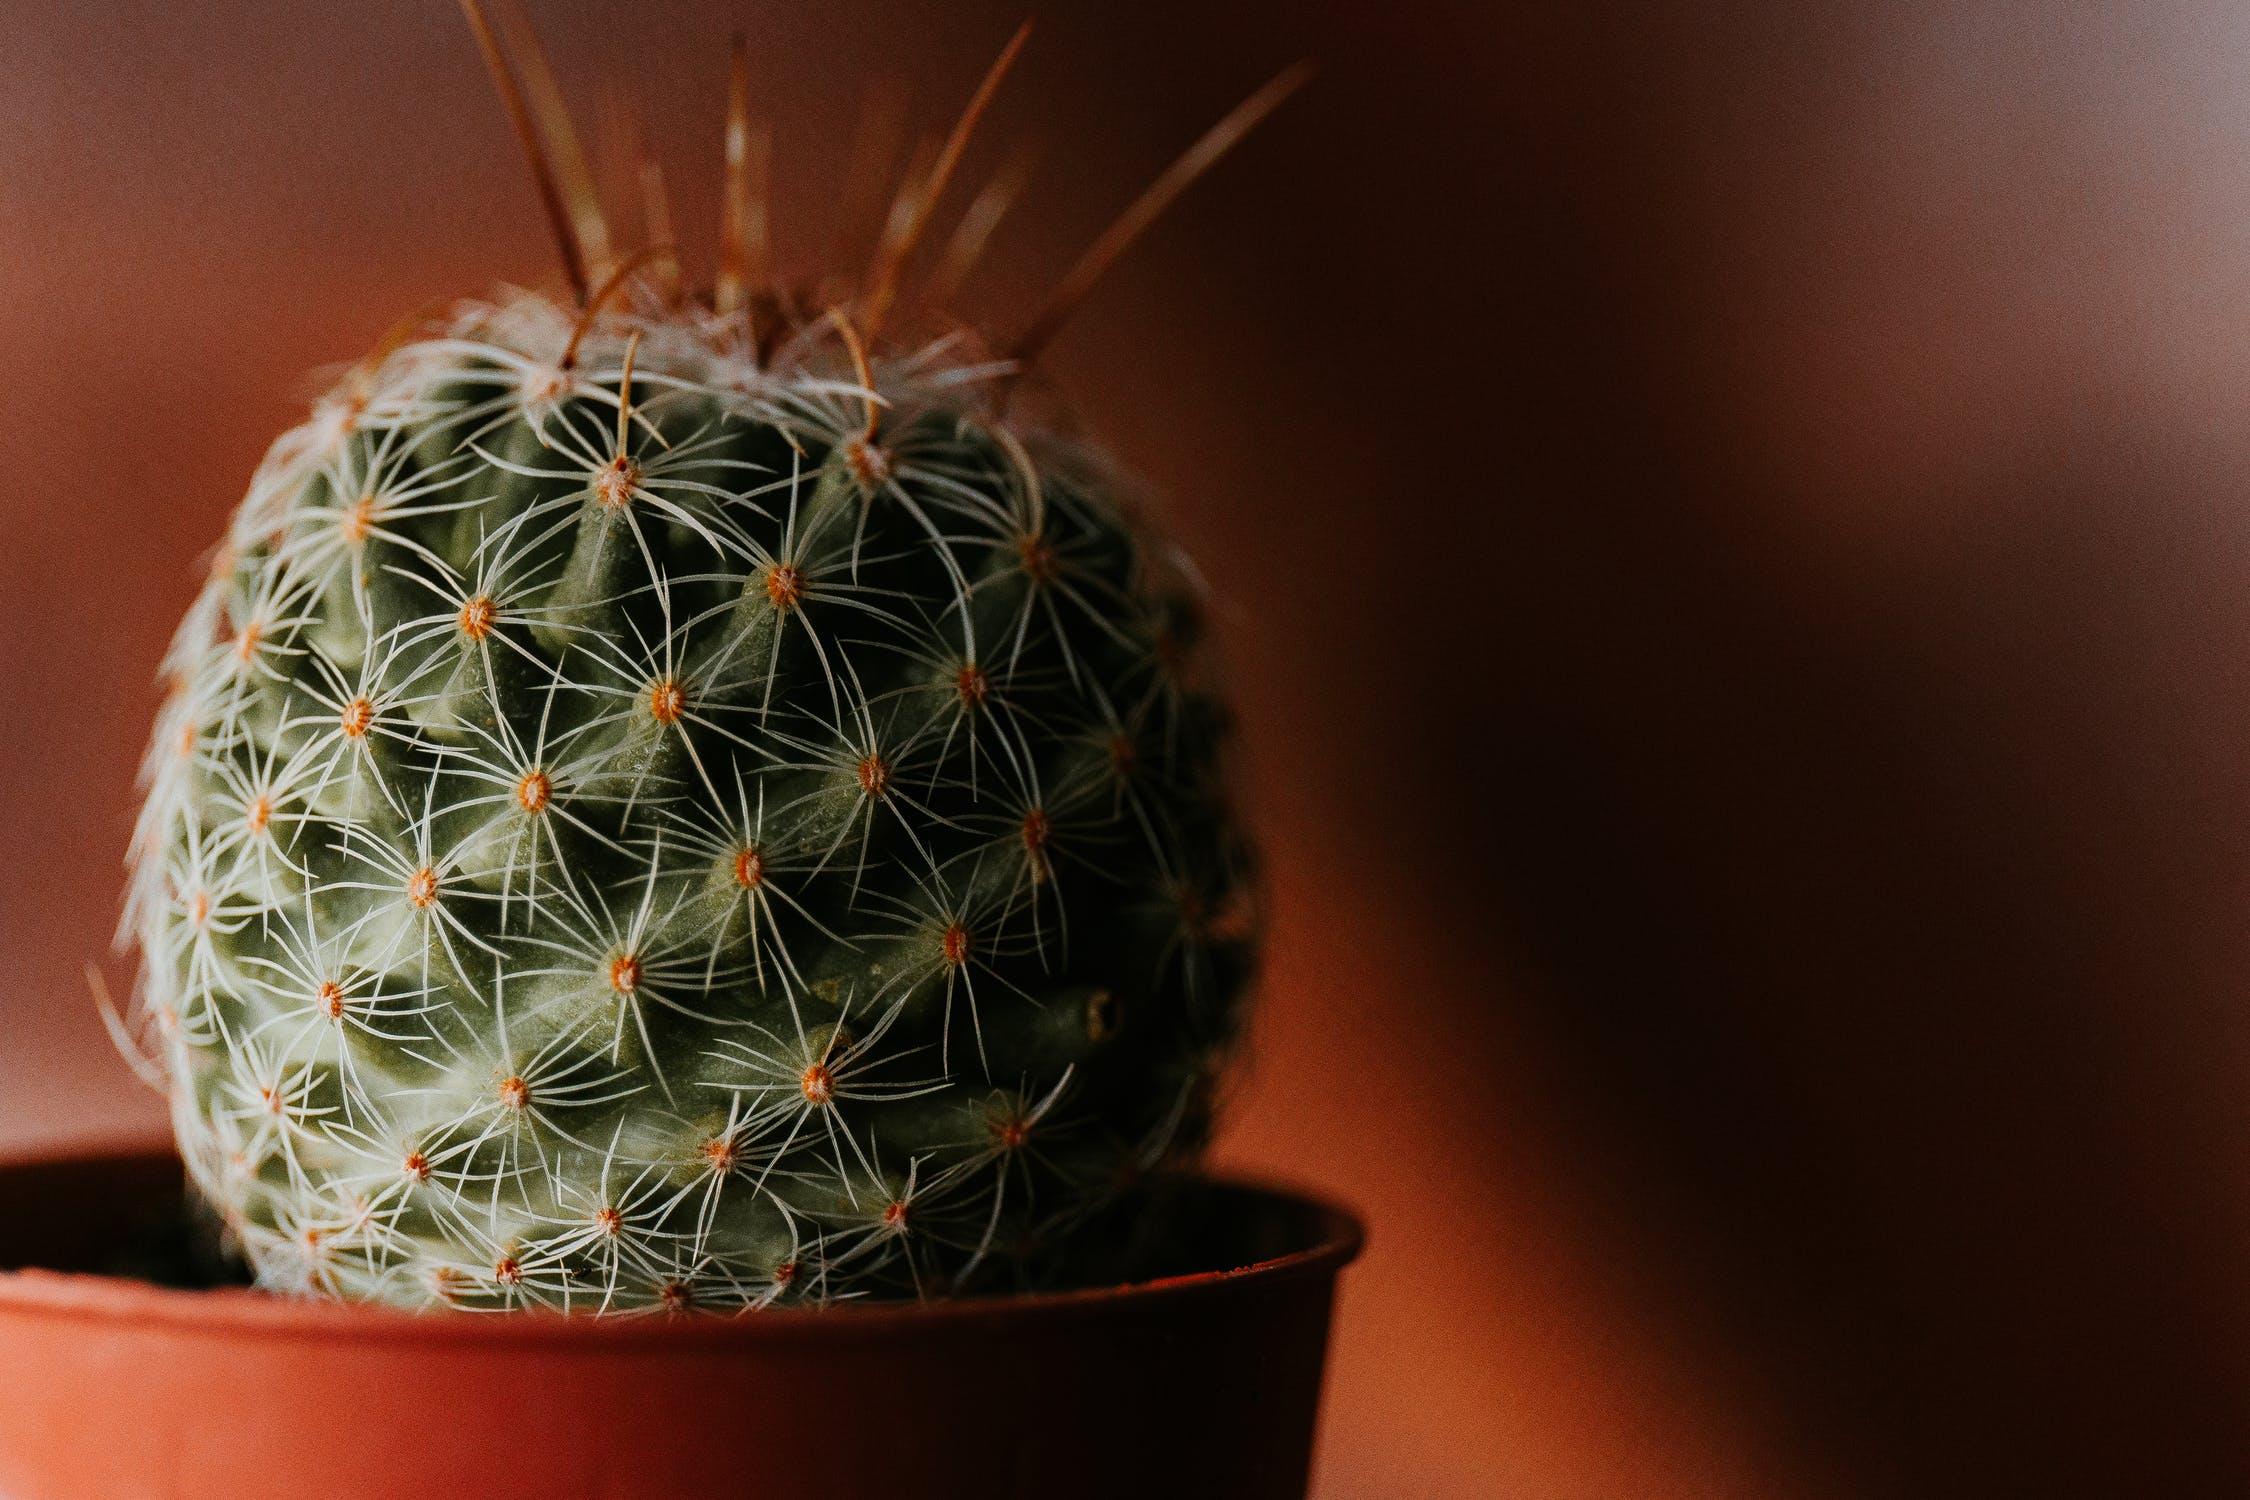 Home cactus, Home cactus